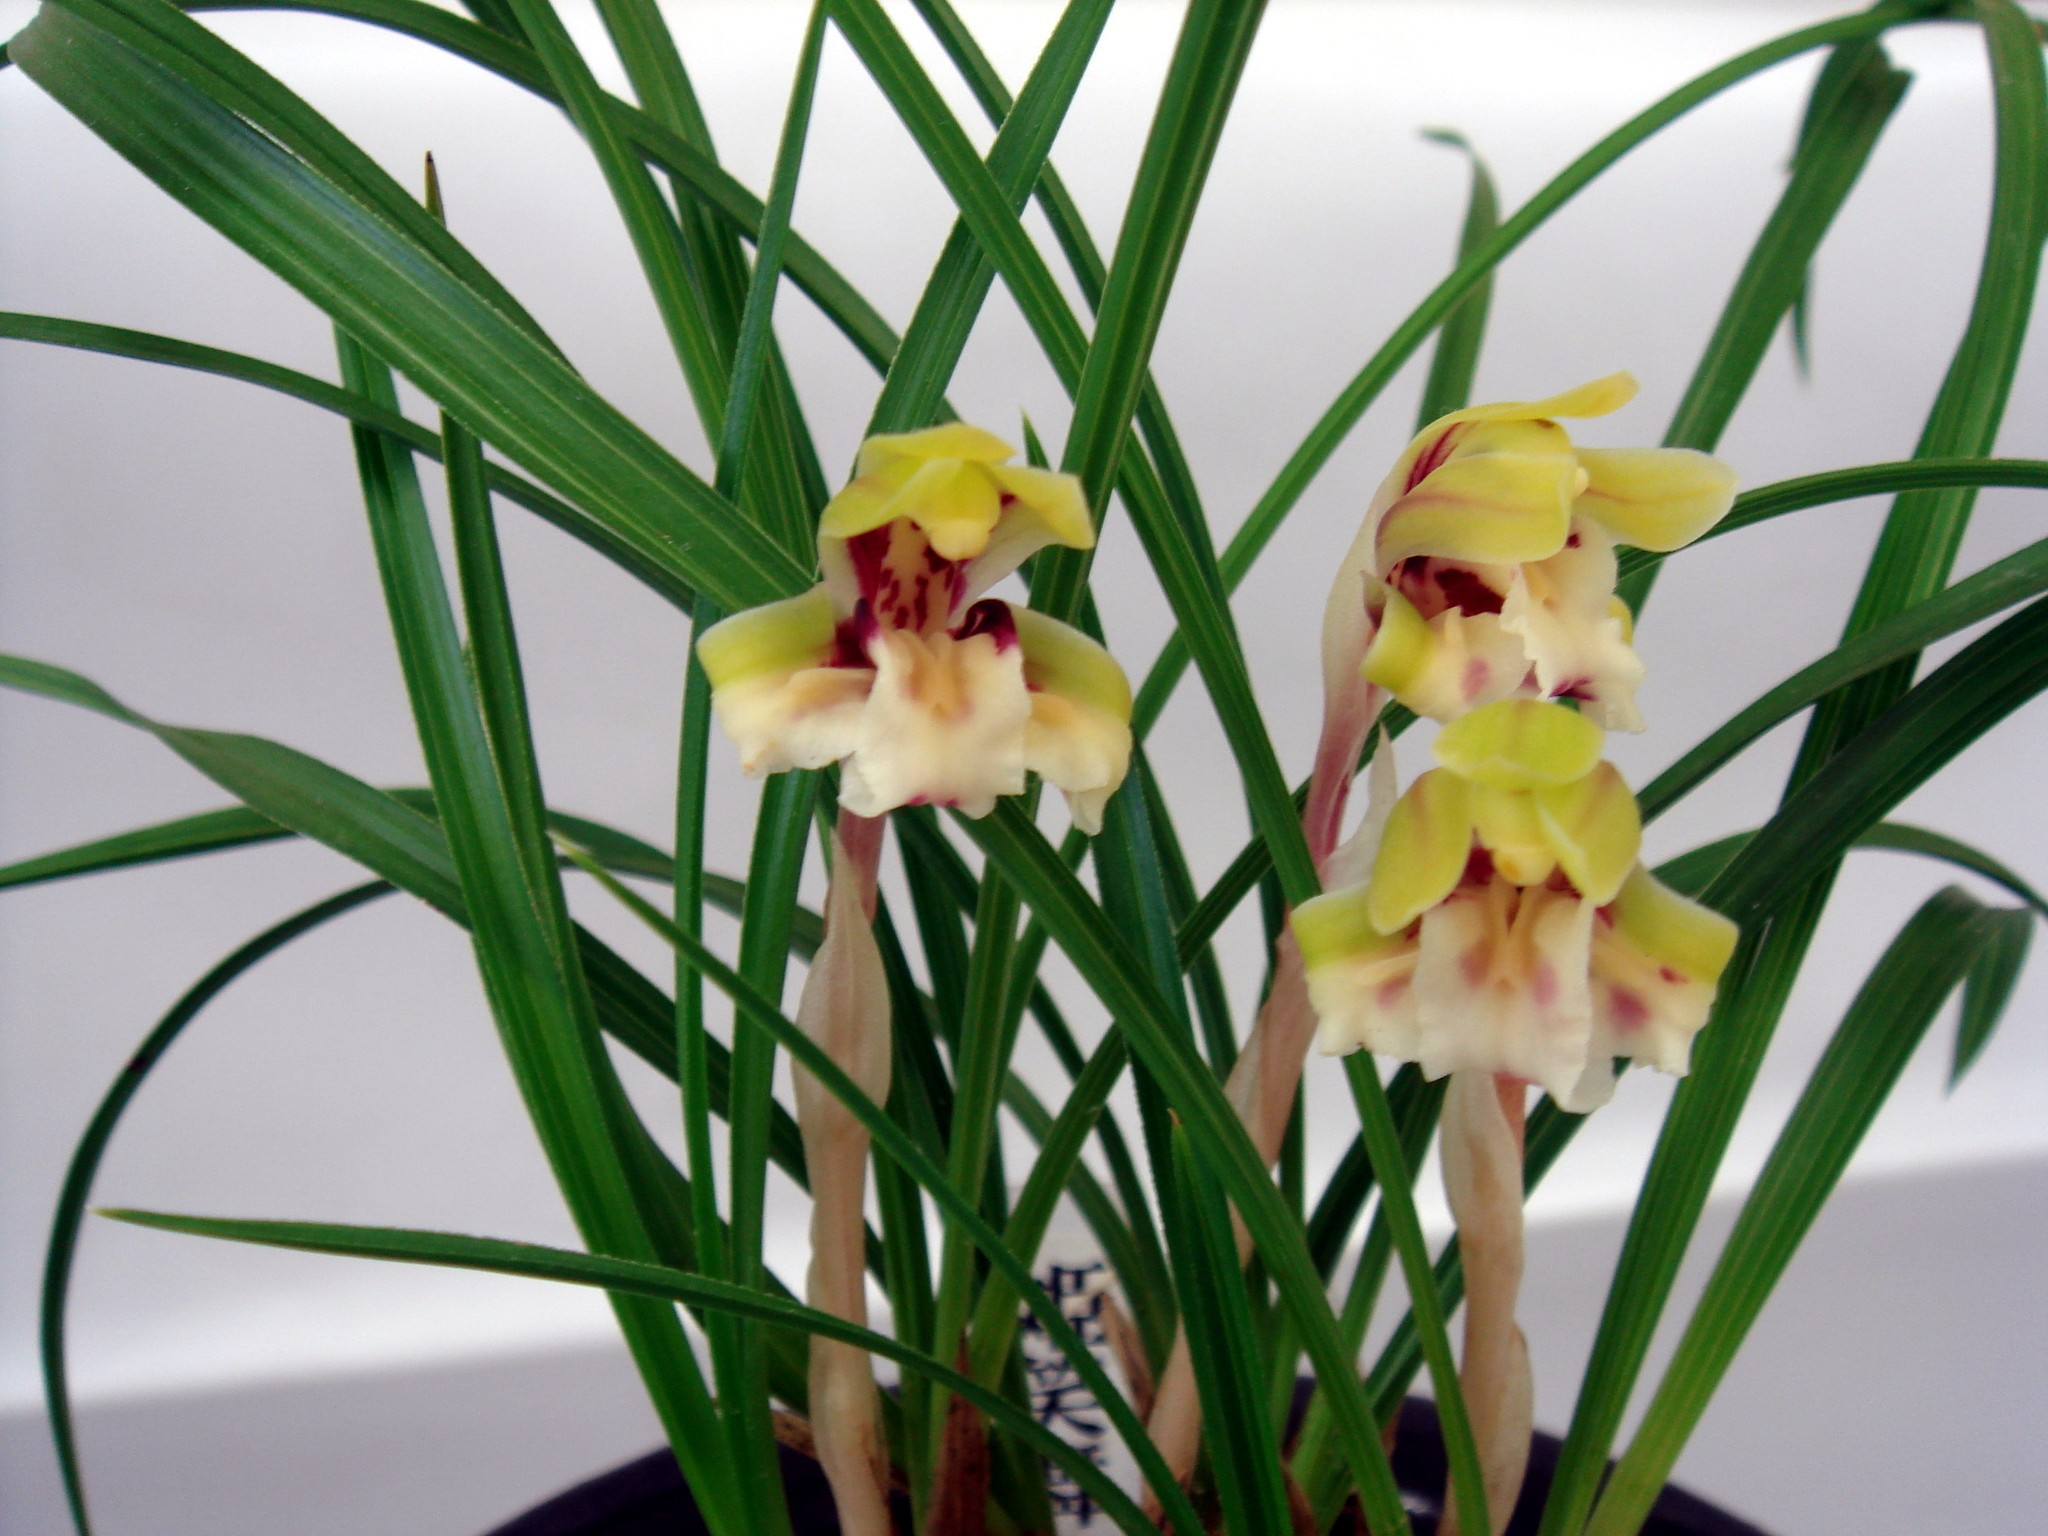 http://www7a.biglobe.ne.jp/~flower_world/images/Cymbidium%20goeringii/DSC04736.JPG